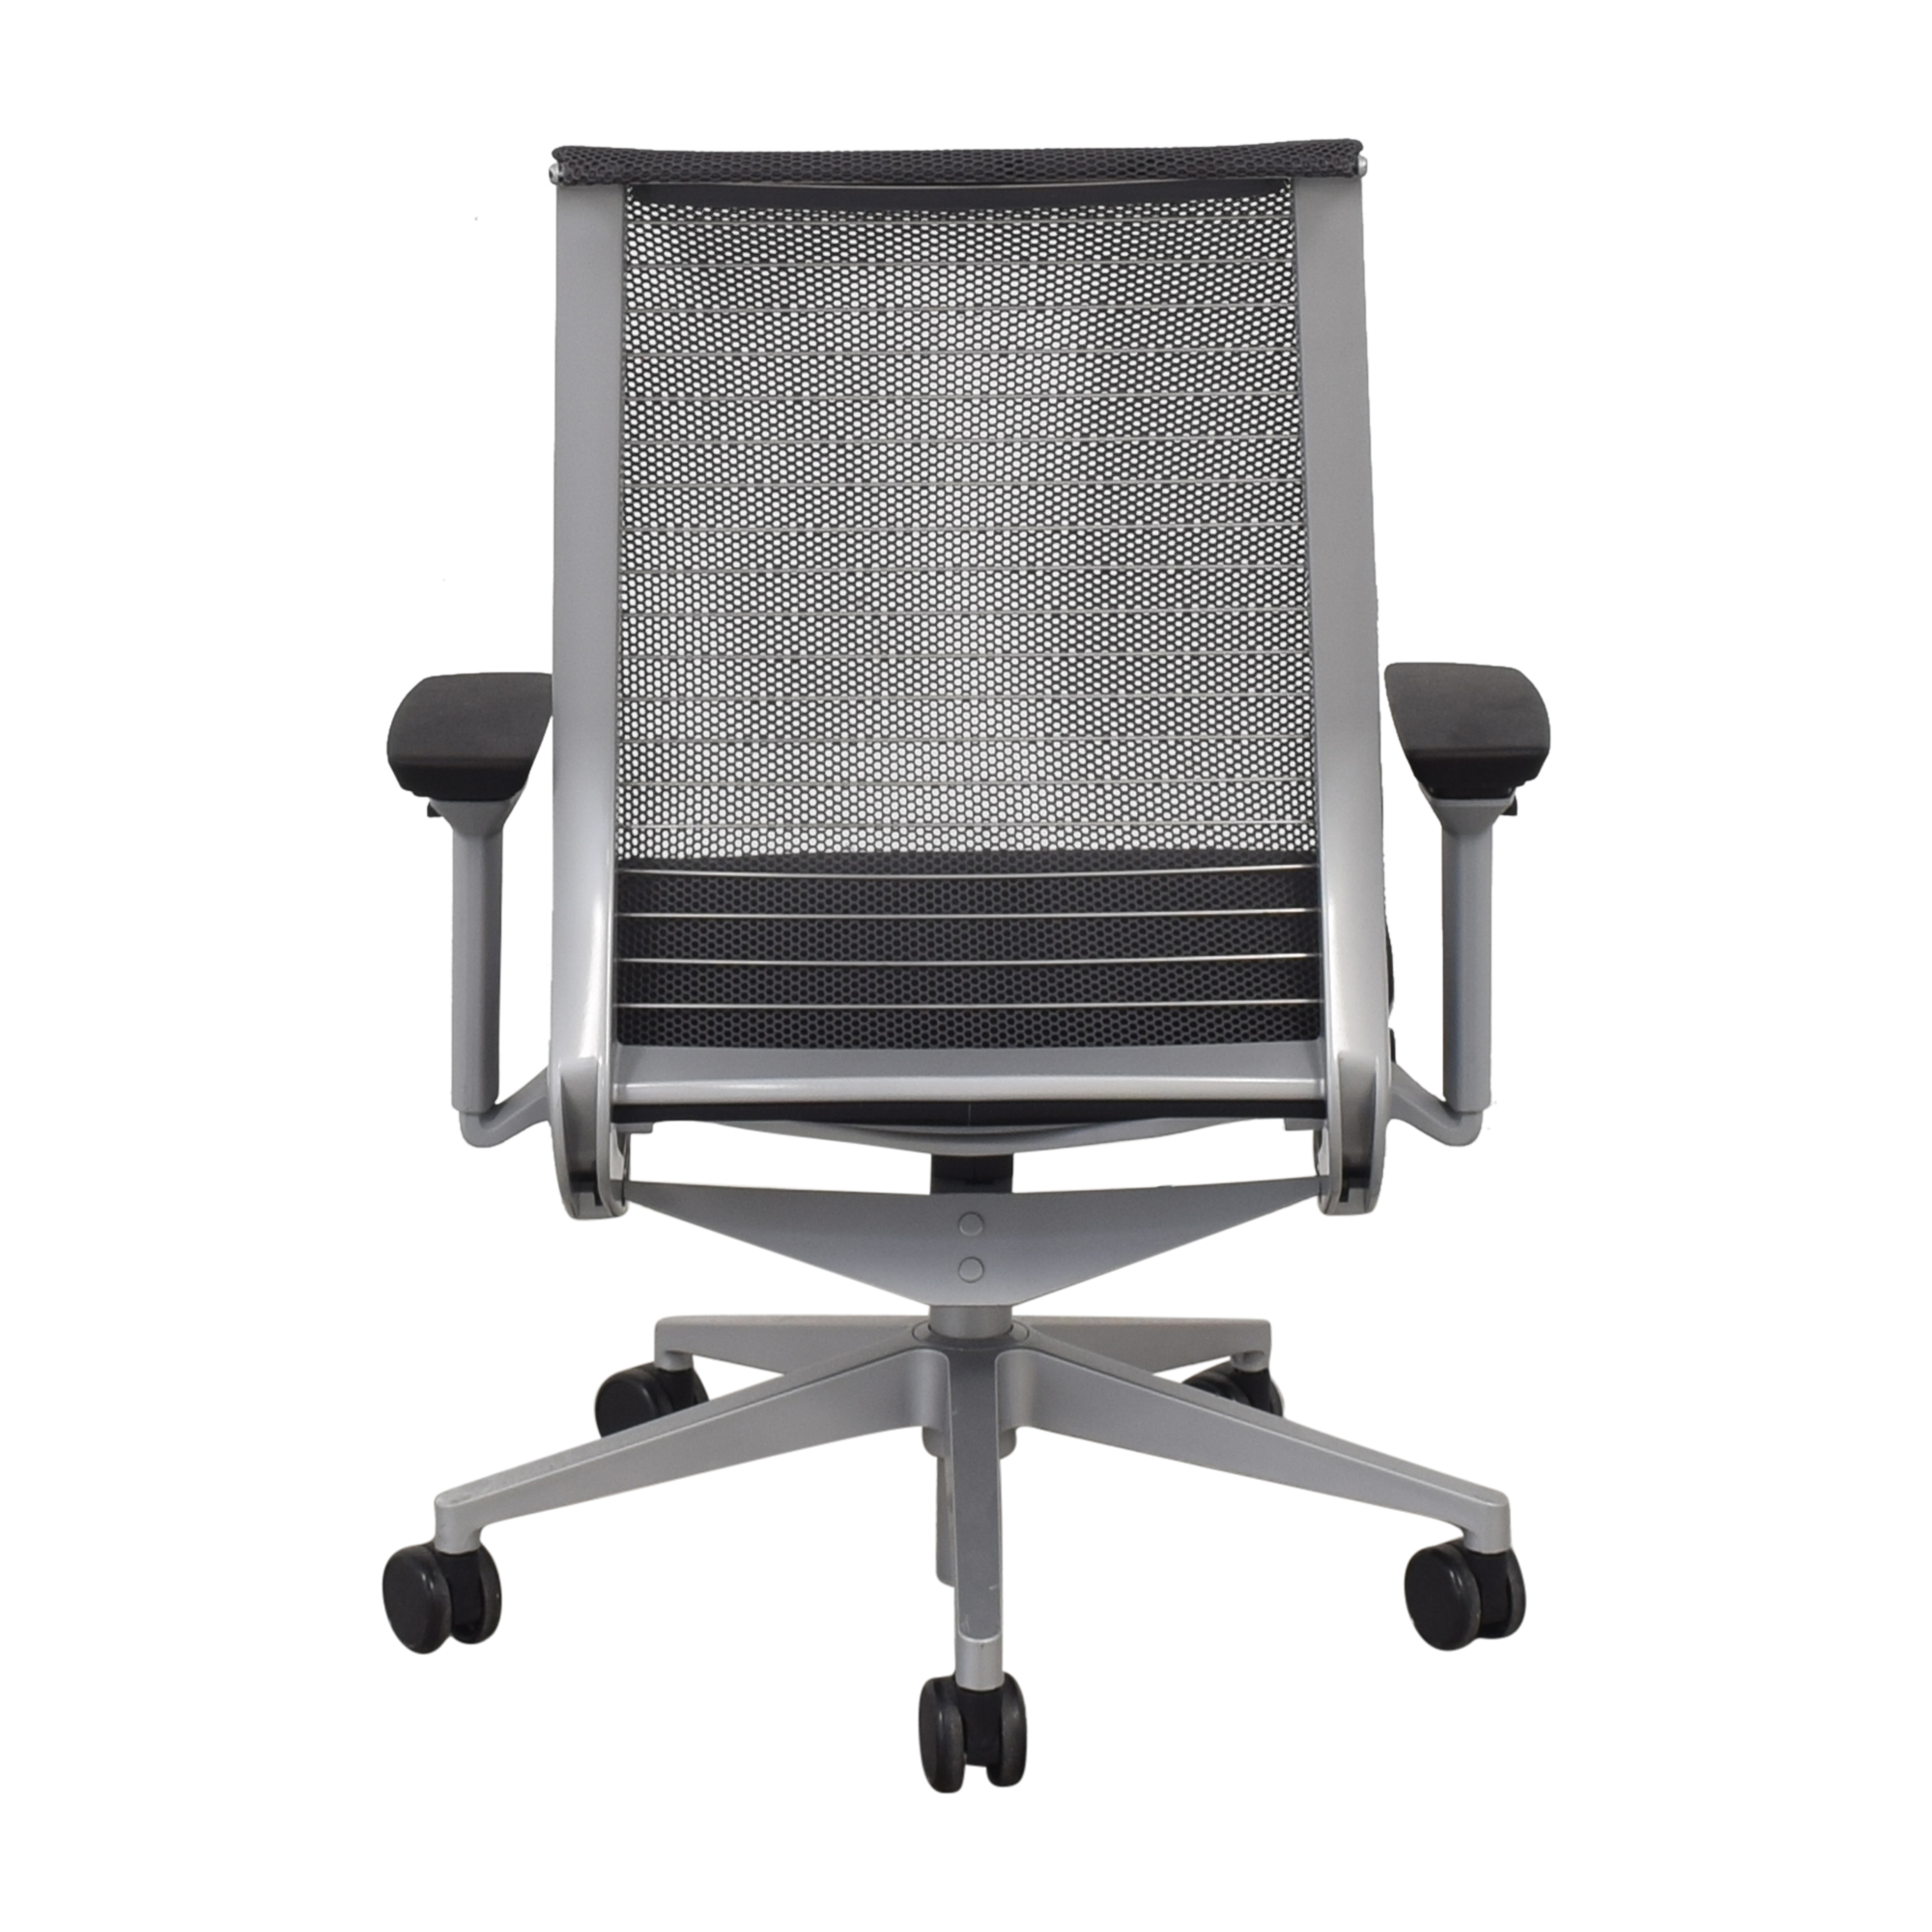 buy Steelcase Cobi Swivel Chair Steelcase Chairs